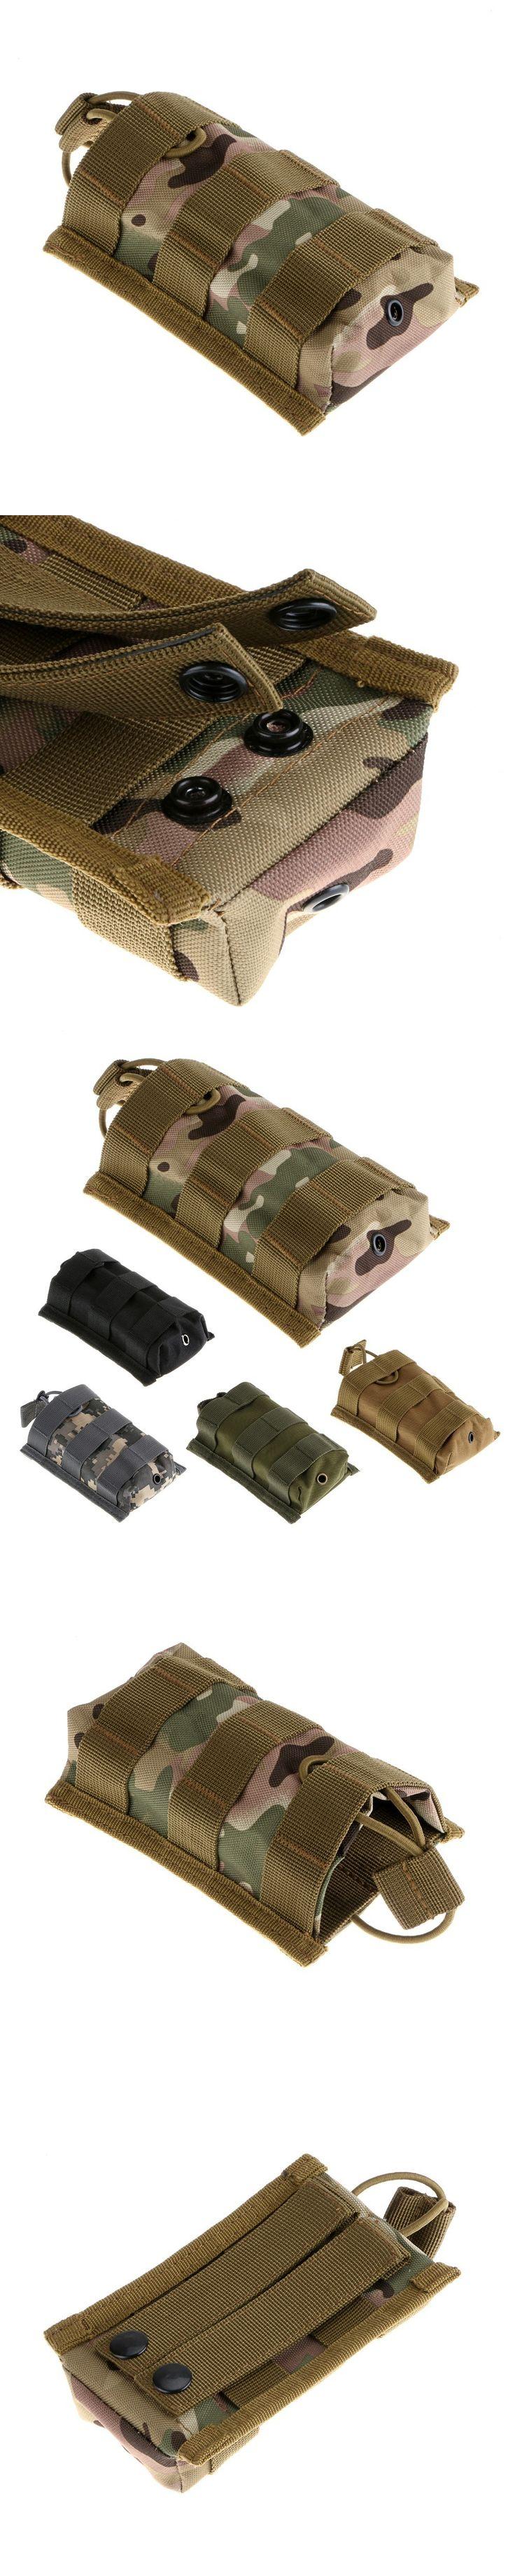 Tactical Molle Pouch Single Rifle Magazine Pouch Open Top Bag Cartridge Clip Pouch For M4/M16 5.56 .223